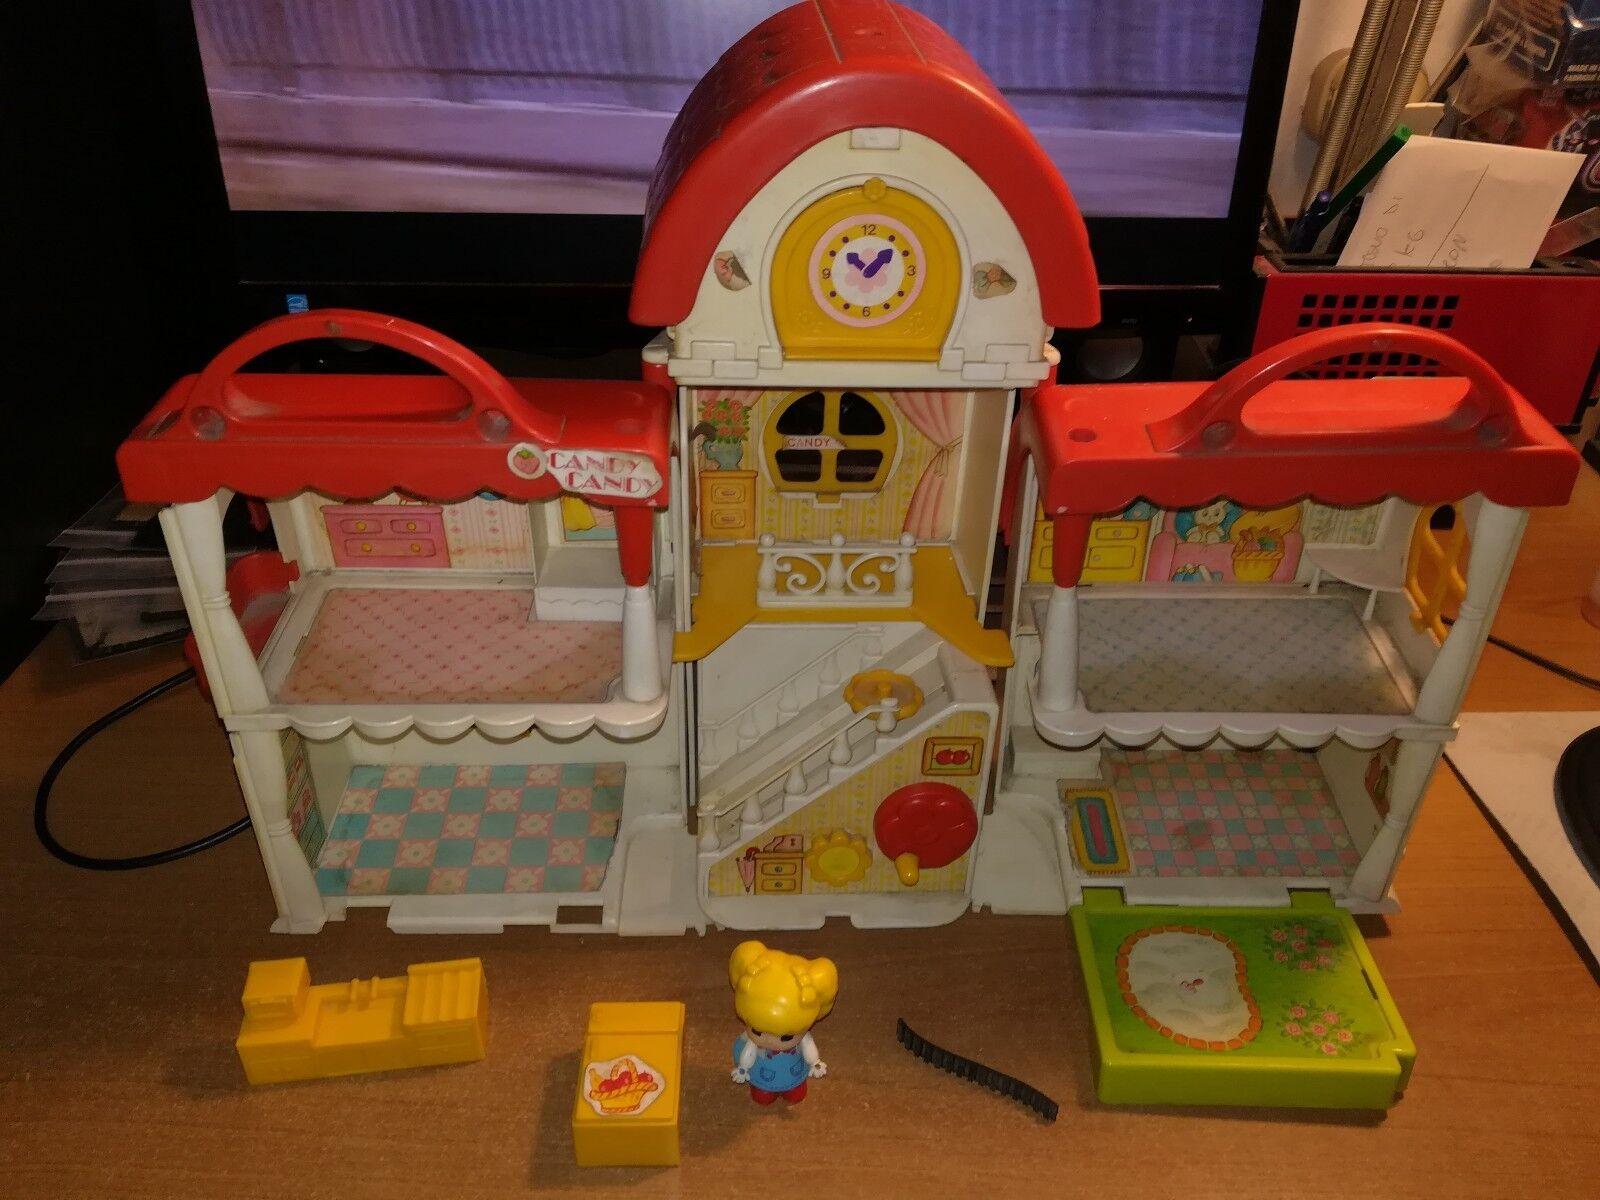 BABY CANDY CANDY PUPATIC KOEDA CHAN LUCIE TAKARA POLISTIL PONY HOUSE VILLAGE